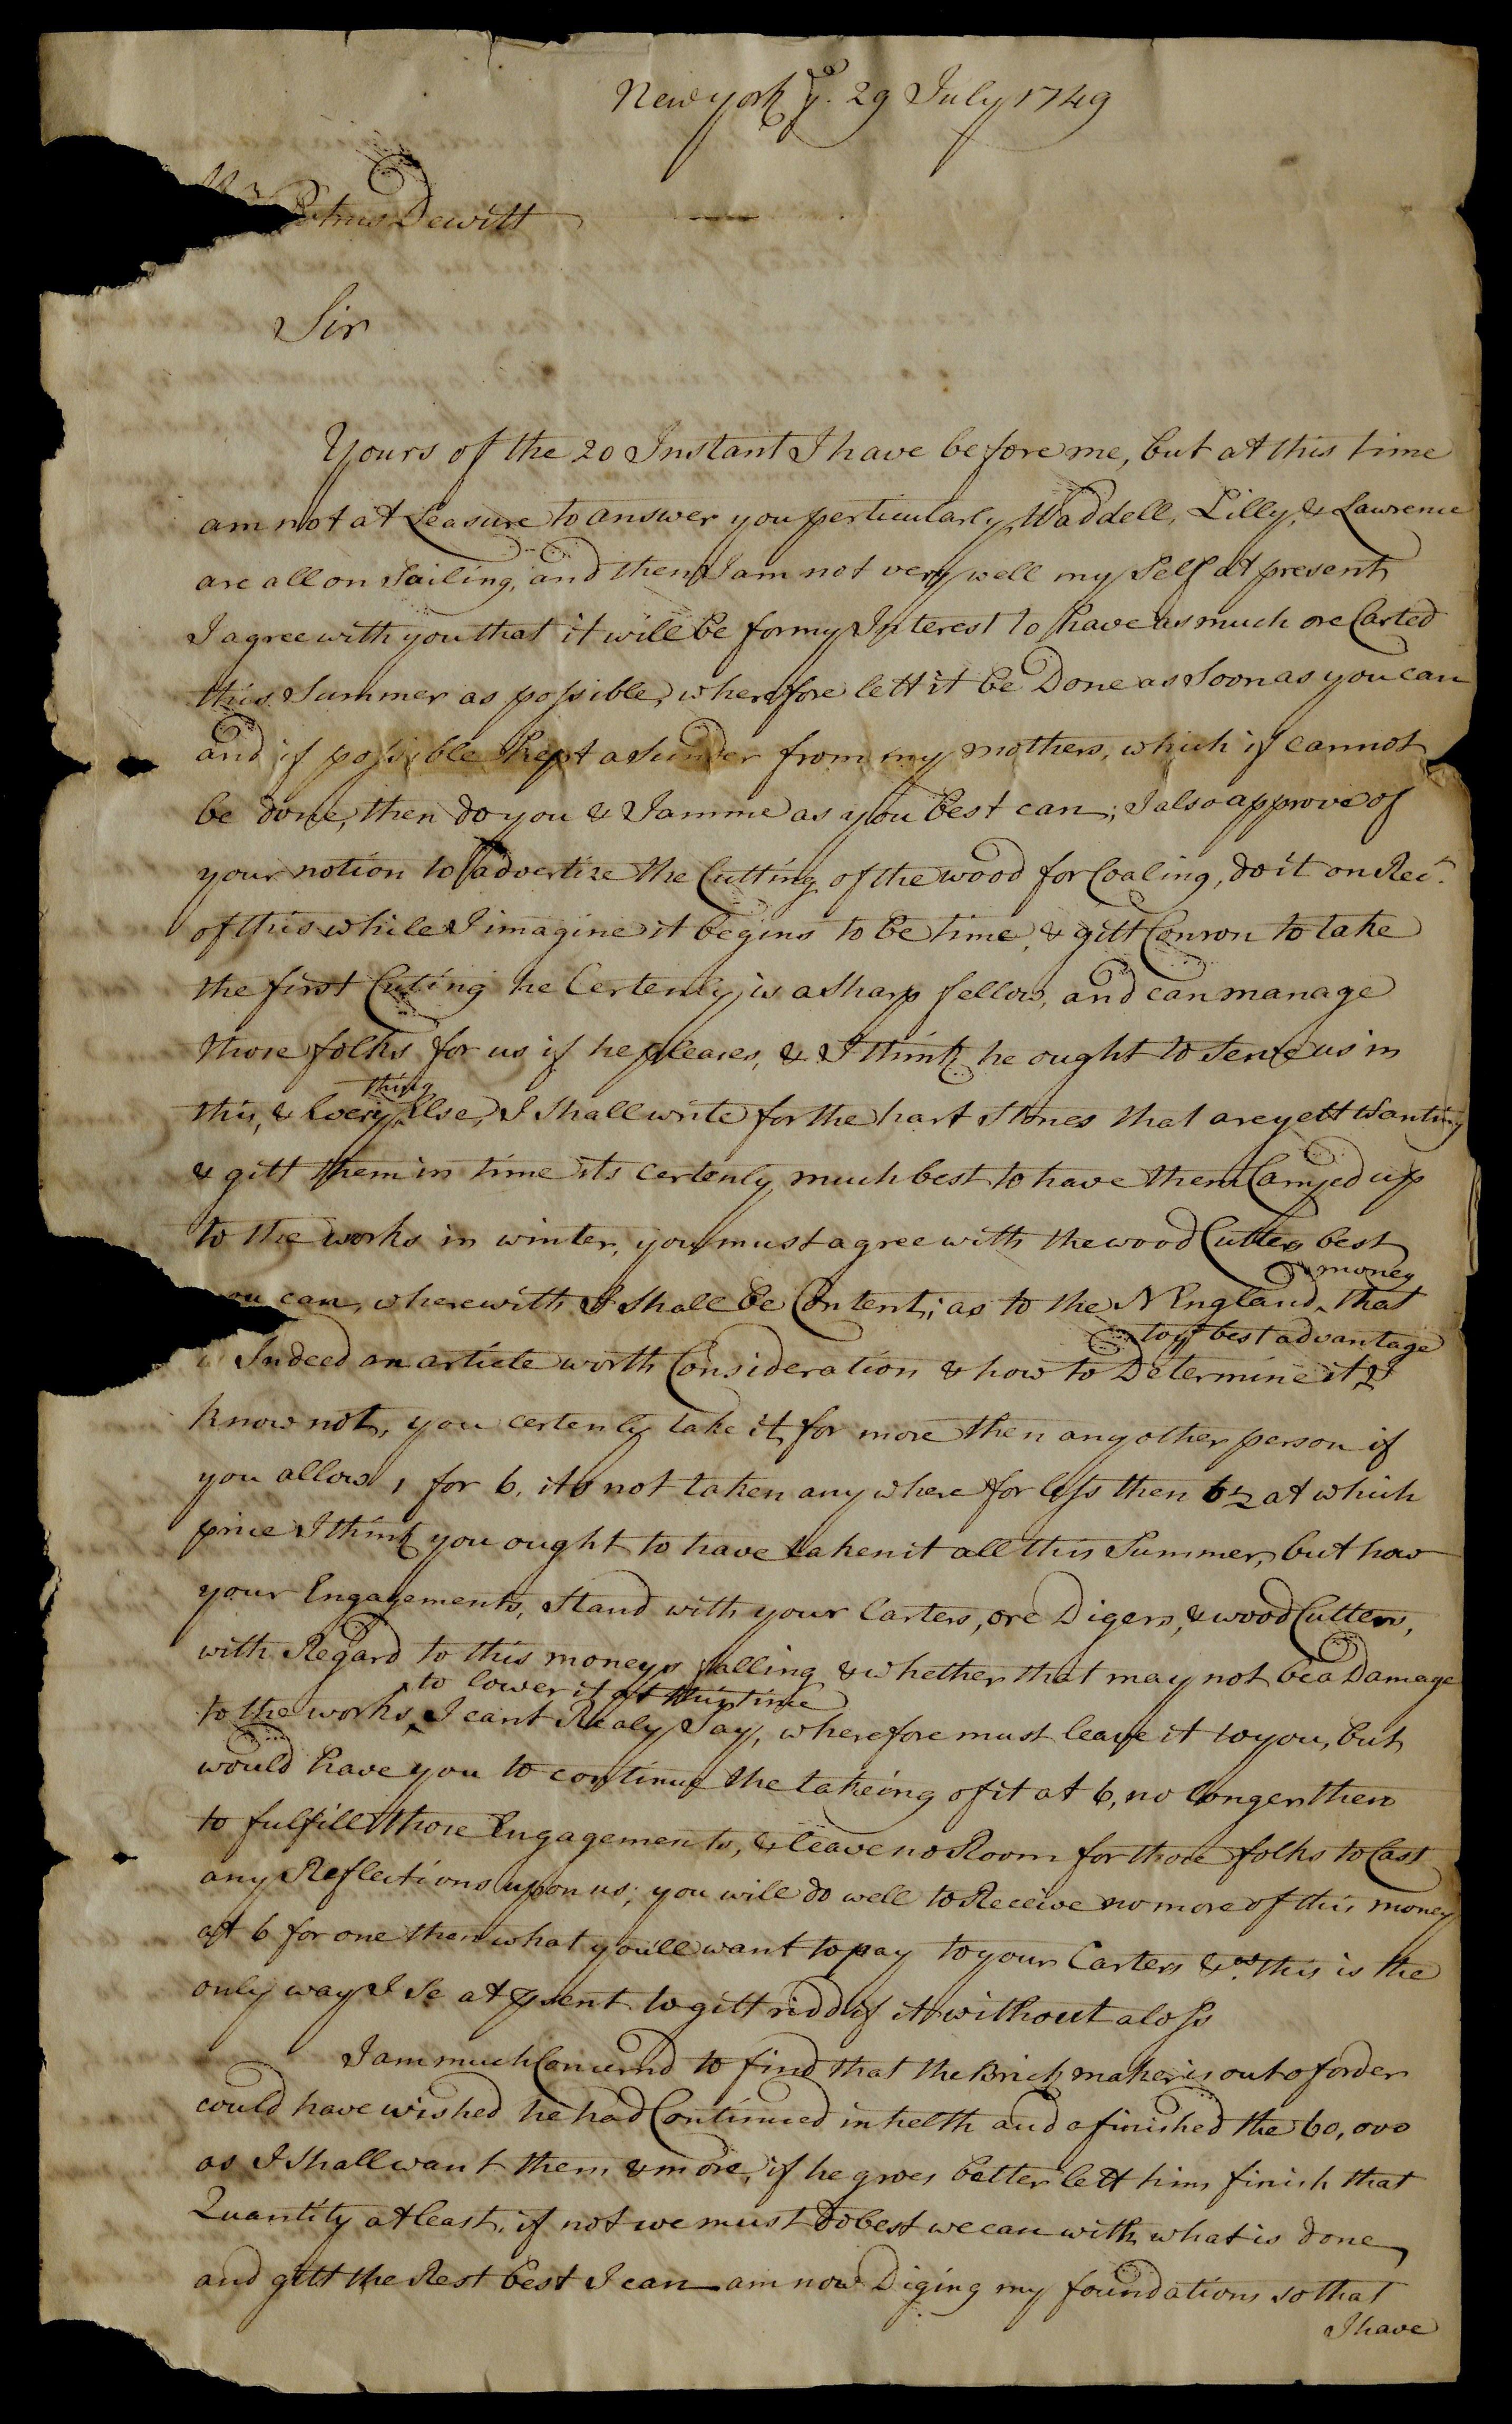 Robert Livingston to Petrus Dewitt, July 29, 1749. (The Gilder Lehrman Institute